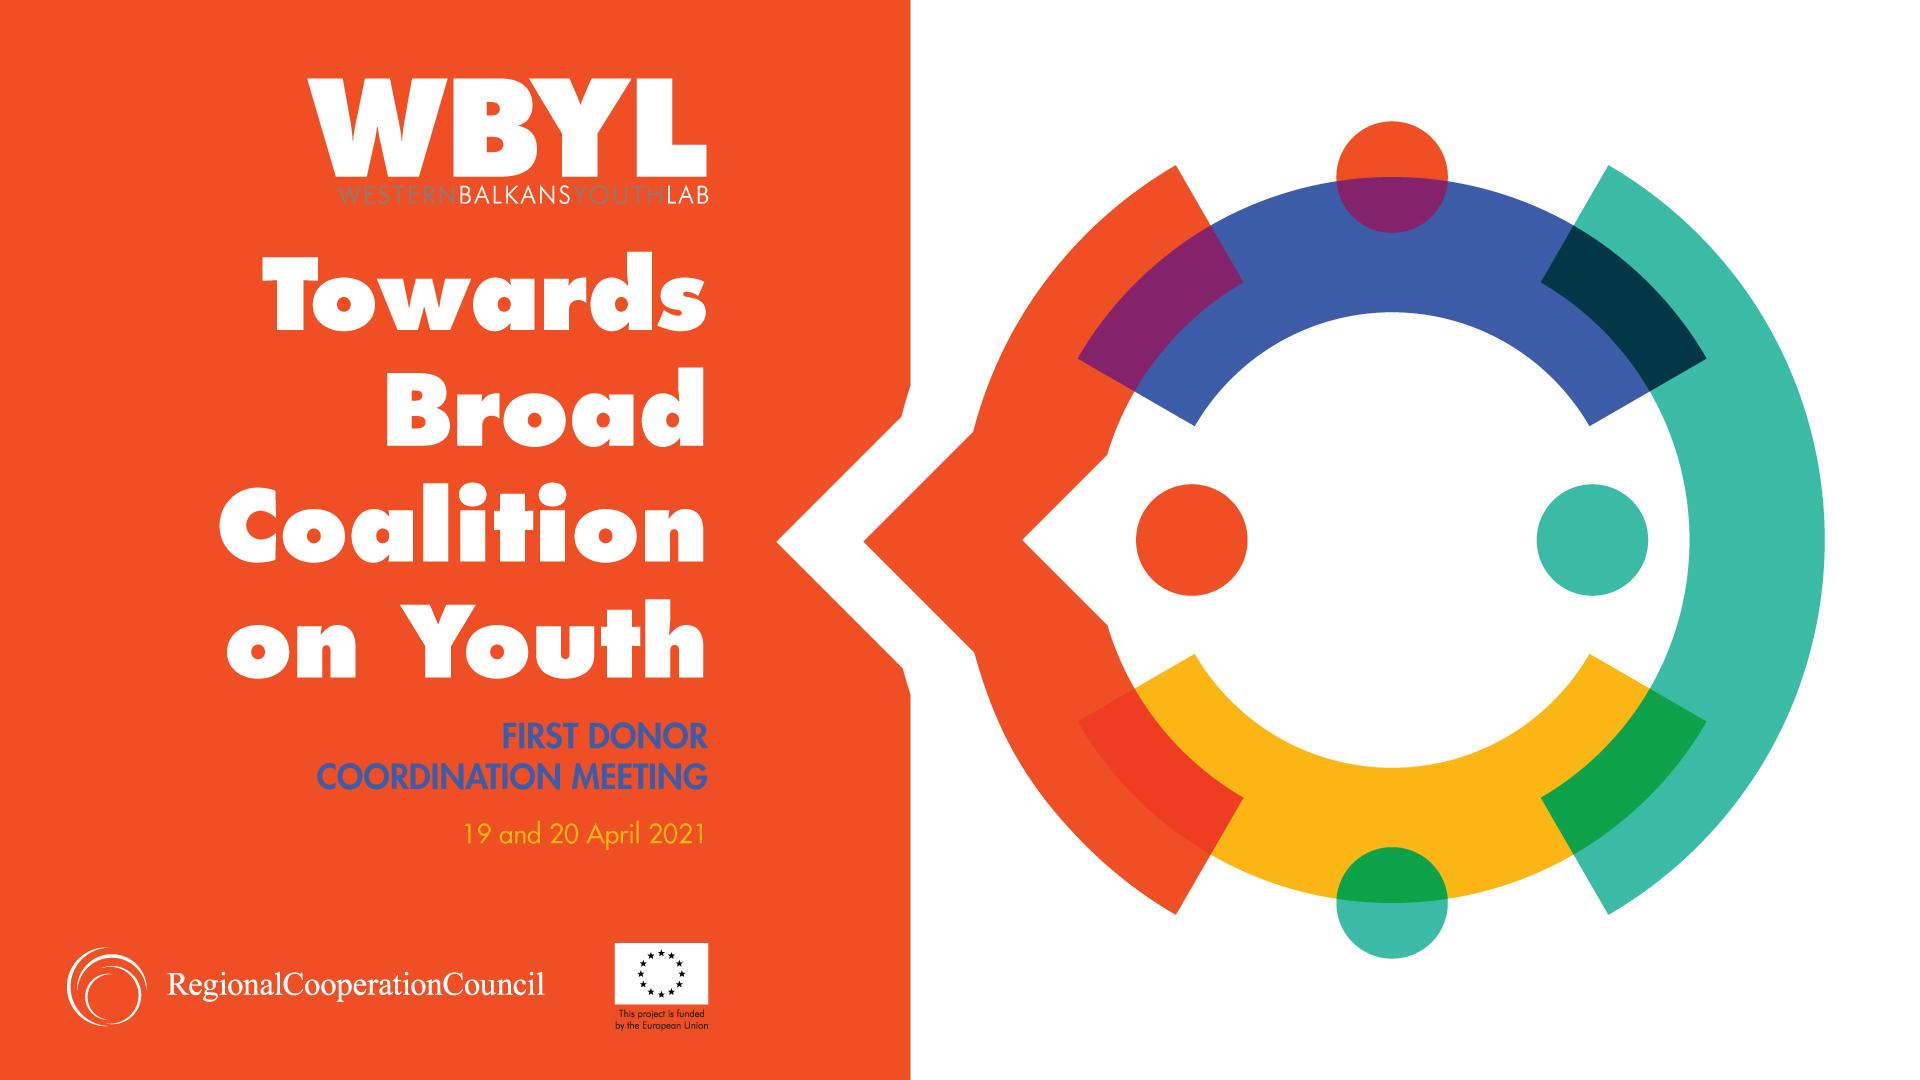 RCC's Western Balkans Youth Lab (WBYL) project organized the First Informal Donor Coordination Meeting on Youth Agenda in the Western Balkans on 19 and 20 April 2021 (Design: RCC/Samir Dedic)